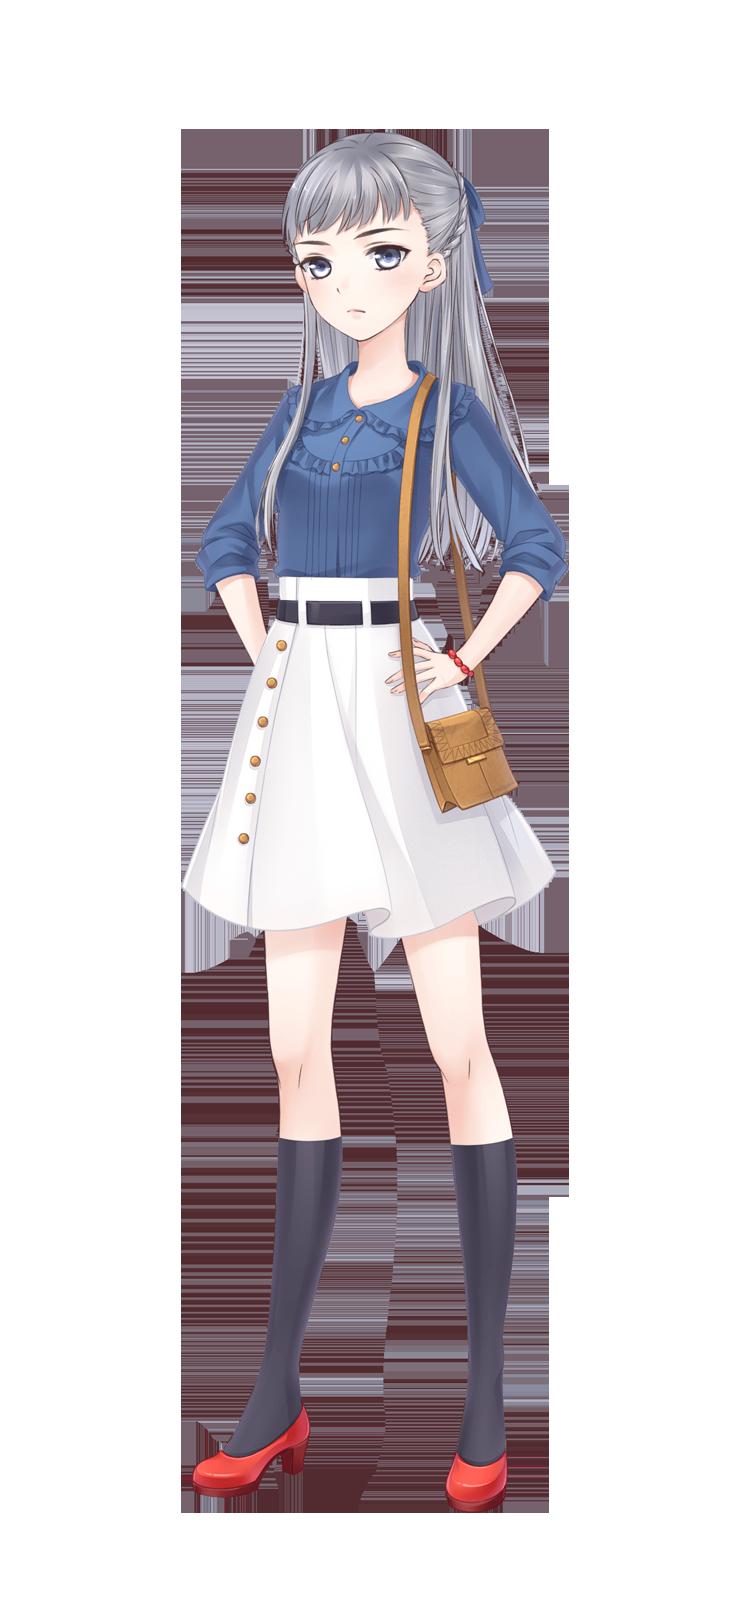 Chapter 17 u6d77u6a31 | u3010u56feu9274u3011u5947u8ff9u6696u6696 u00b7 u30dfu30e9u30afu30ebu30cbu30ad u00b7 Miracle Nikki | Pinterest | Anime Manga and Characters